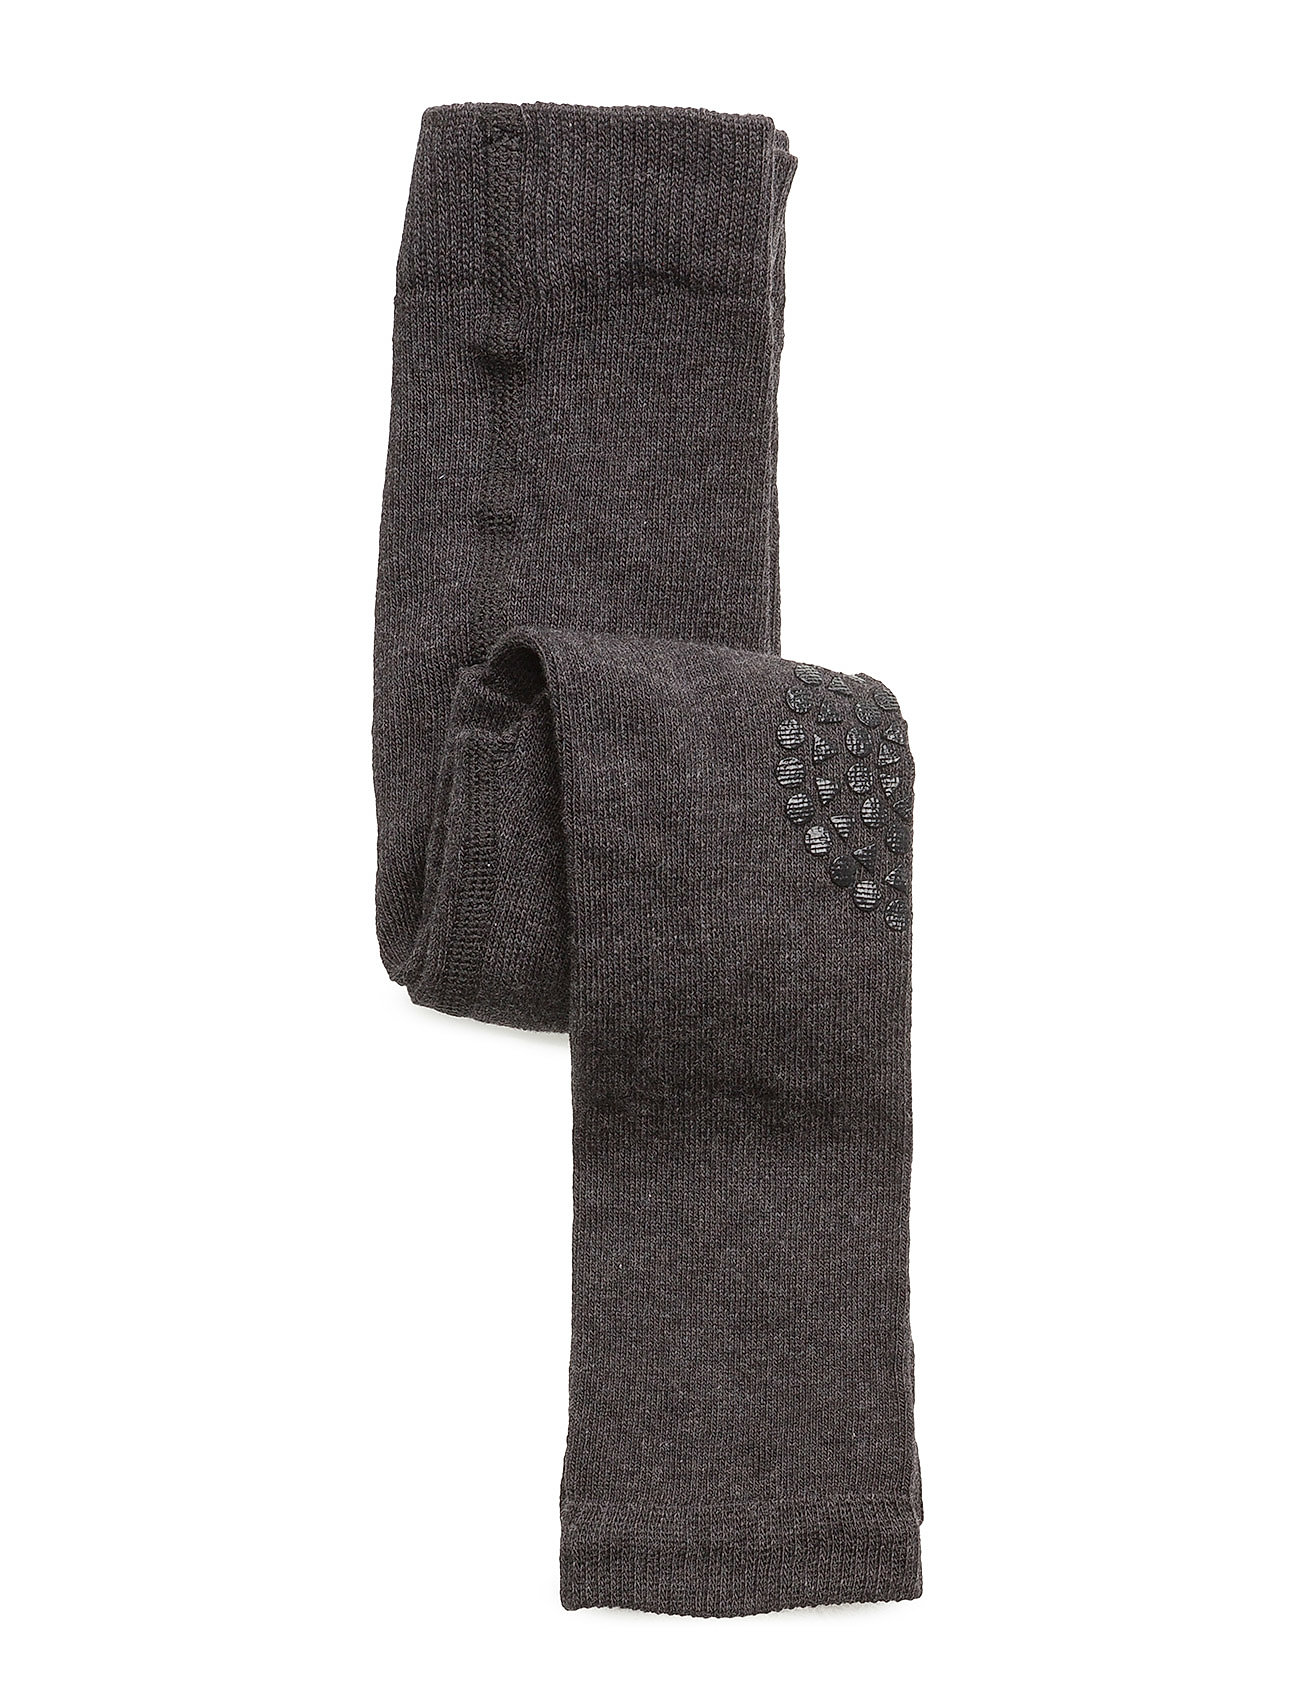 GoBabyGo Leggings - DARK GREY MéLANGE